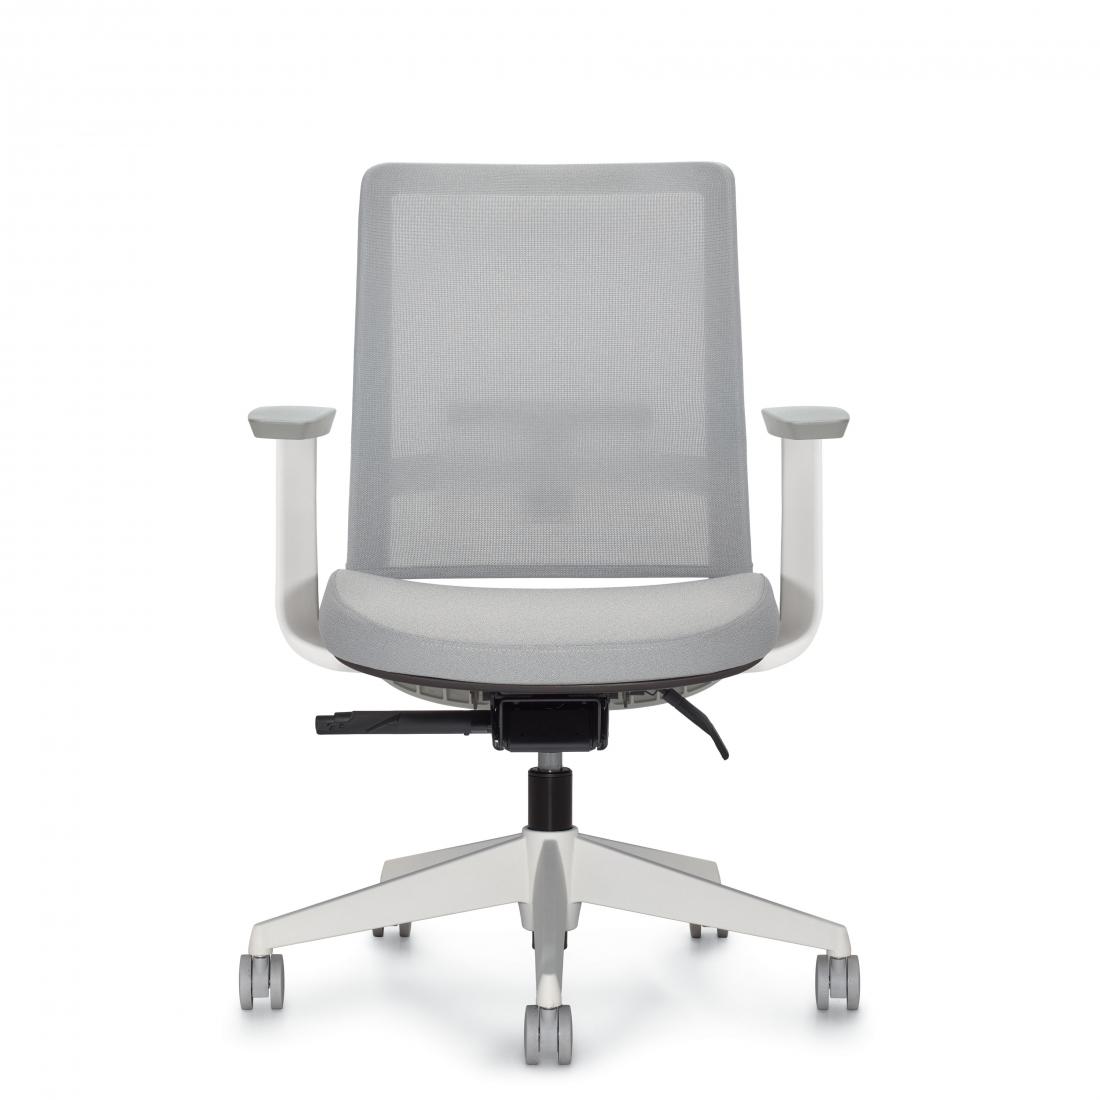 global factor series mid back mesh chair model 5541